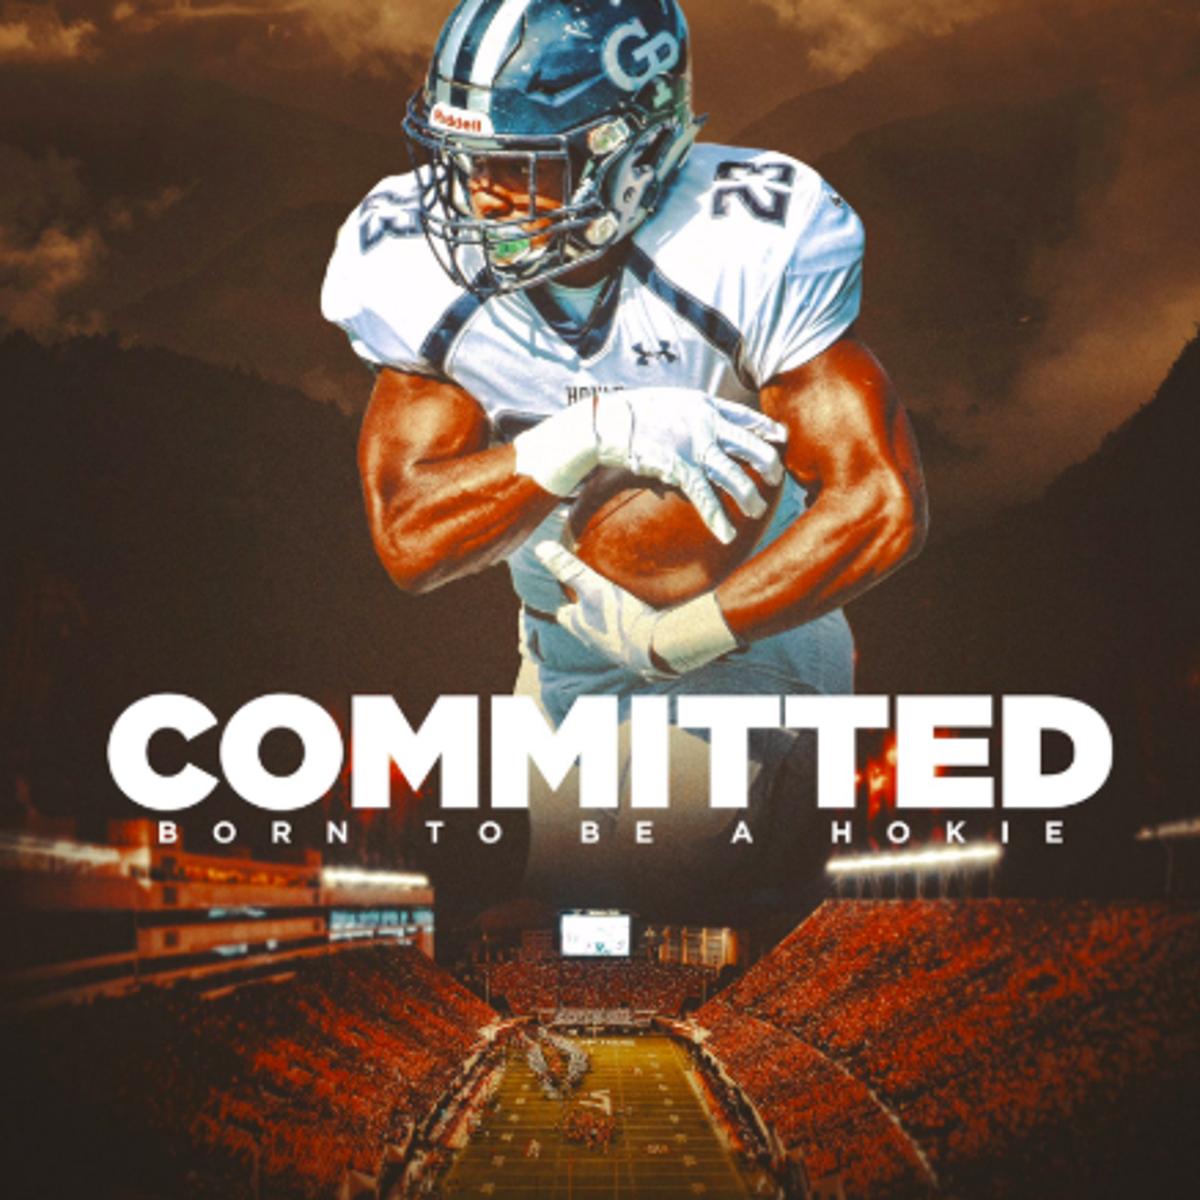 Virginia Tech Football Schedule 2020.Virginia Tech Loading Up On Running Backs For 2020 Class